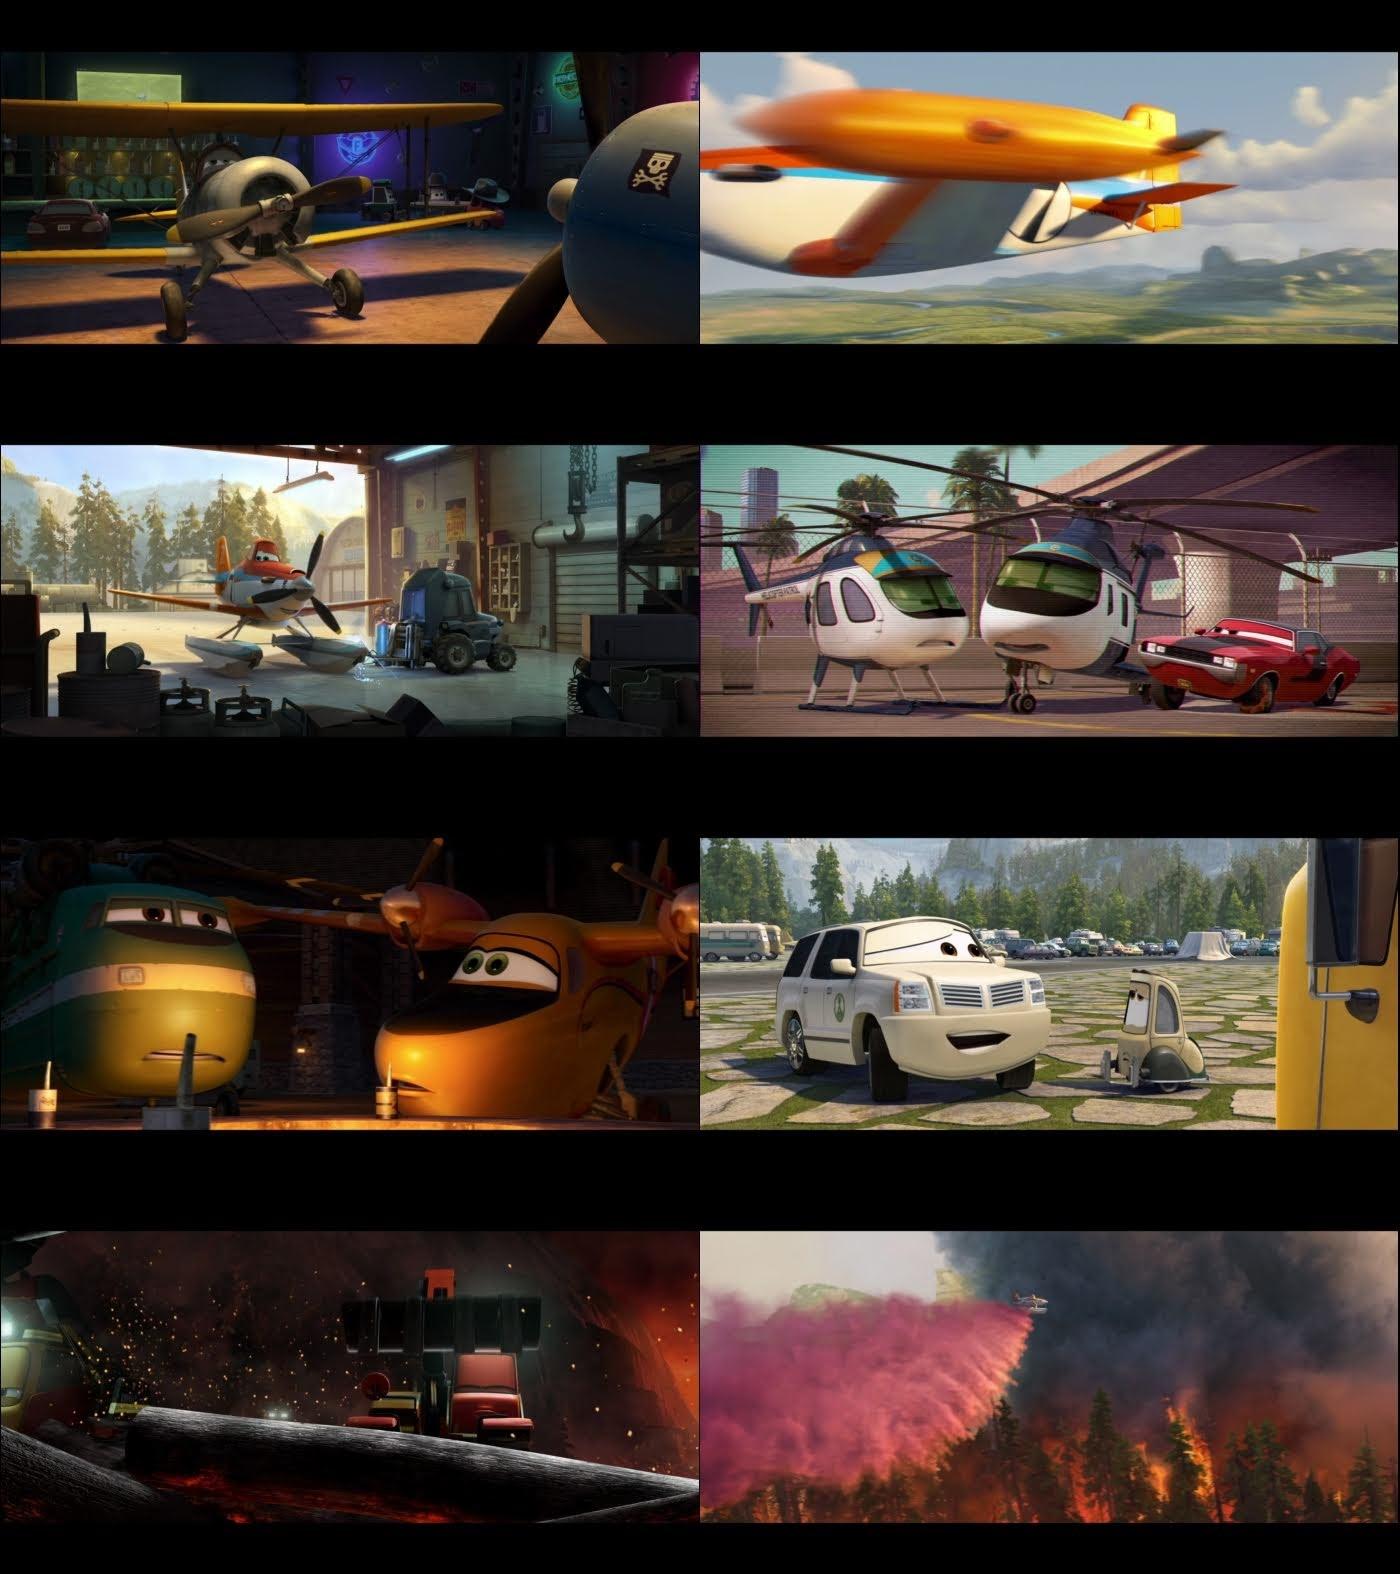 Aviones 2 1080p Latino